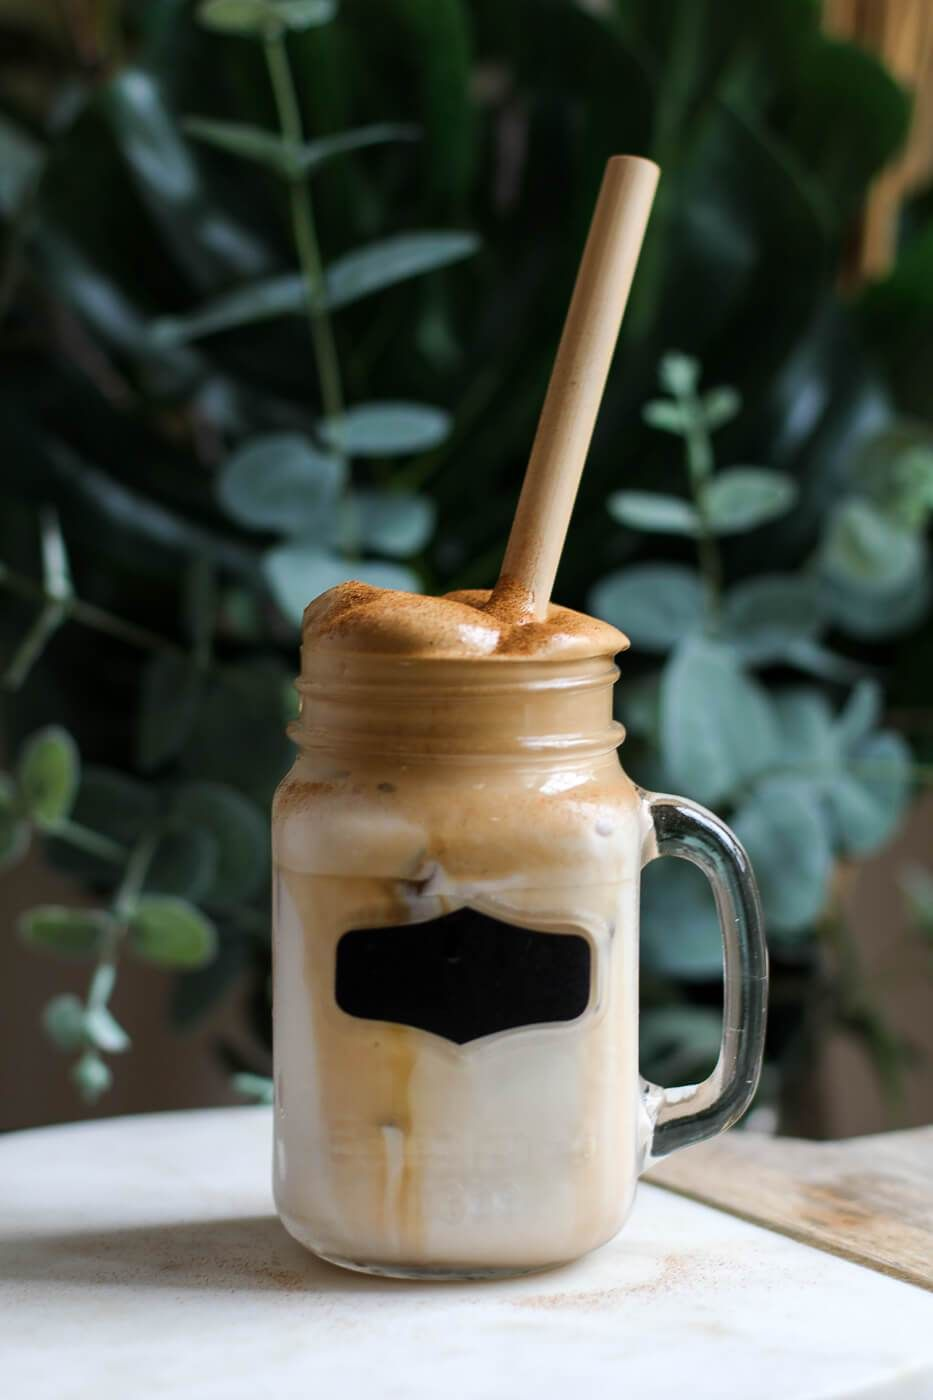 Dalgona Coffee Recipe - How to Make Whipped Coffee ...